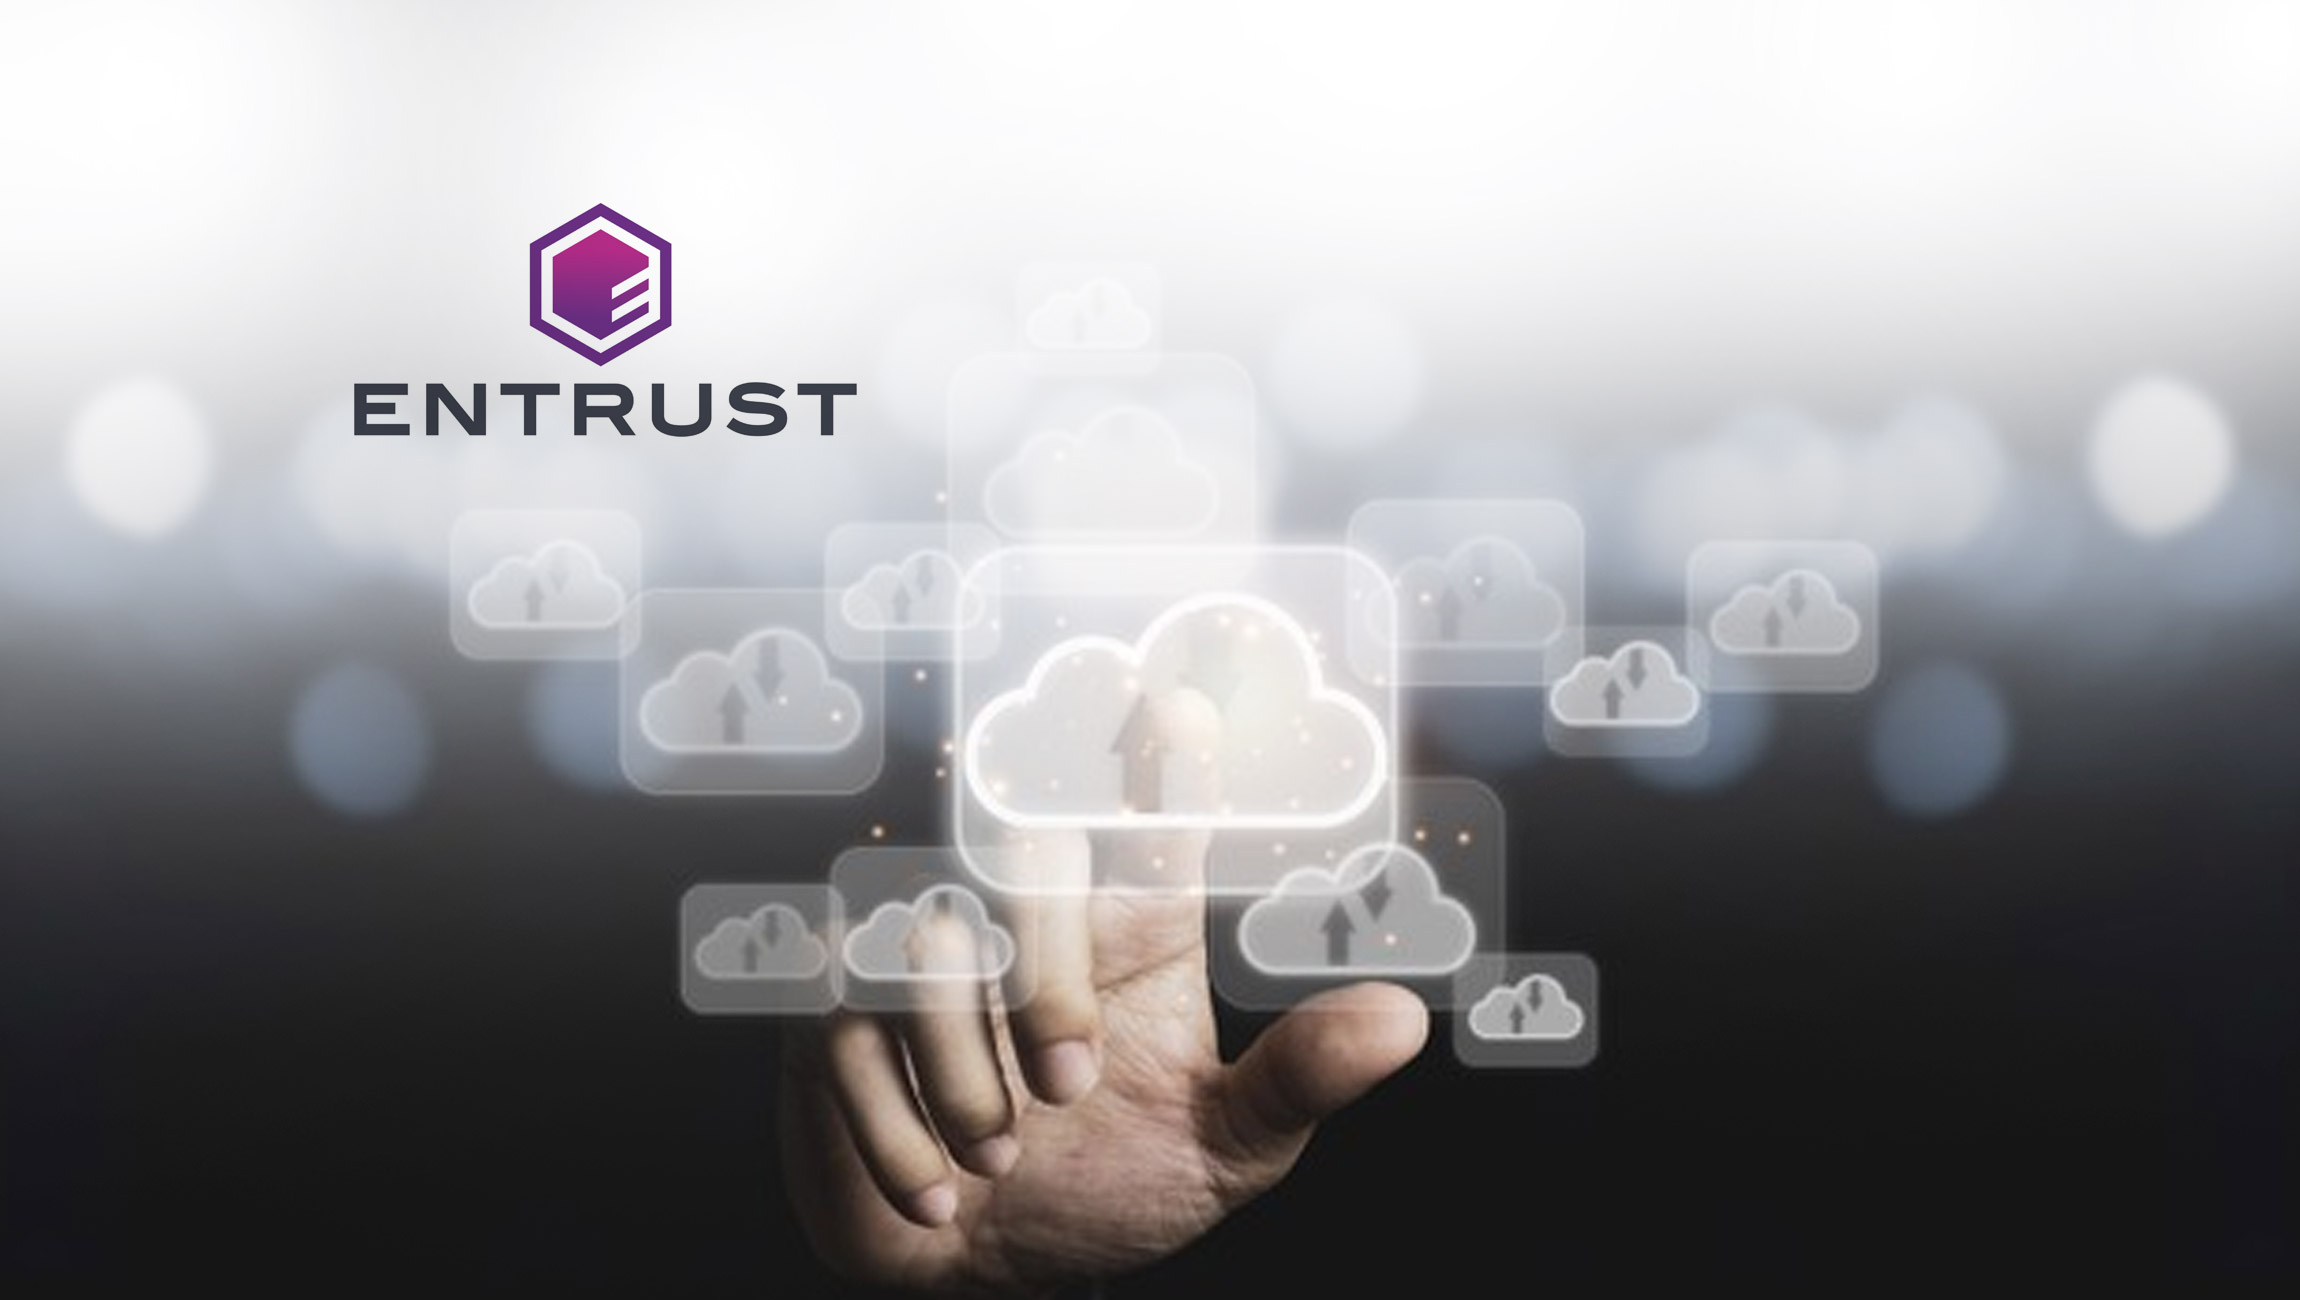 Entrust Brings Security Management to VMware Cloud Foundation with HyTrust CloudControl